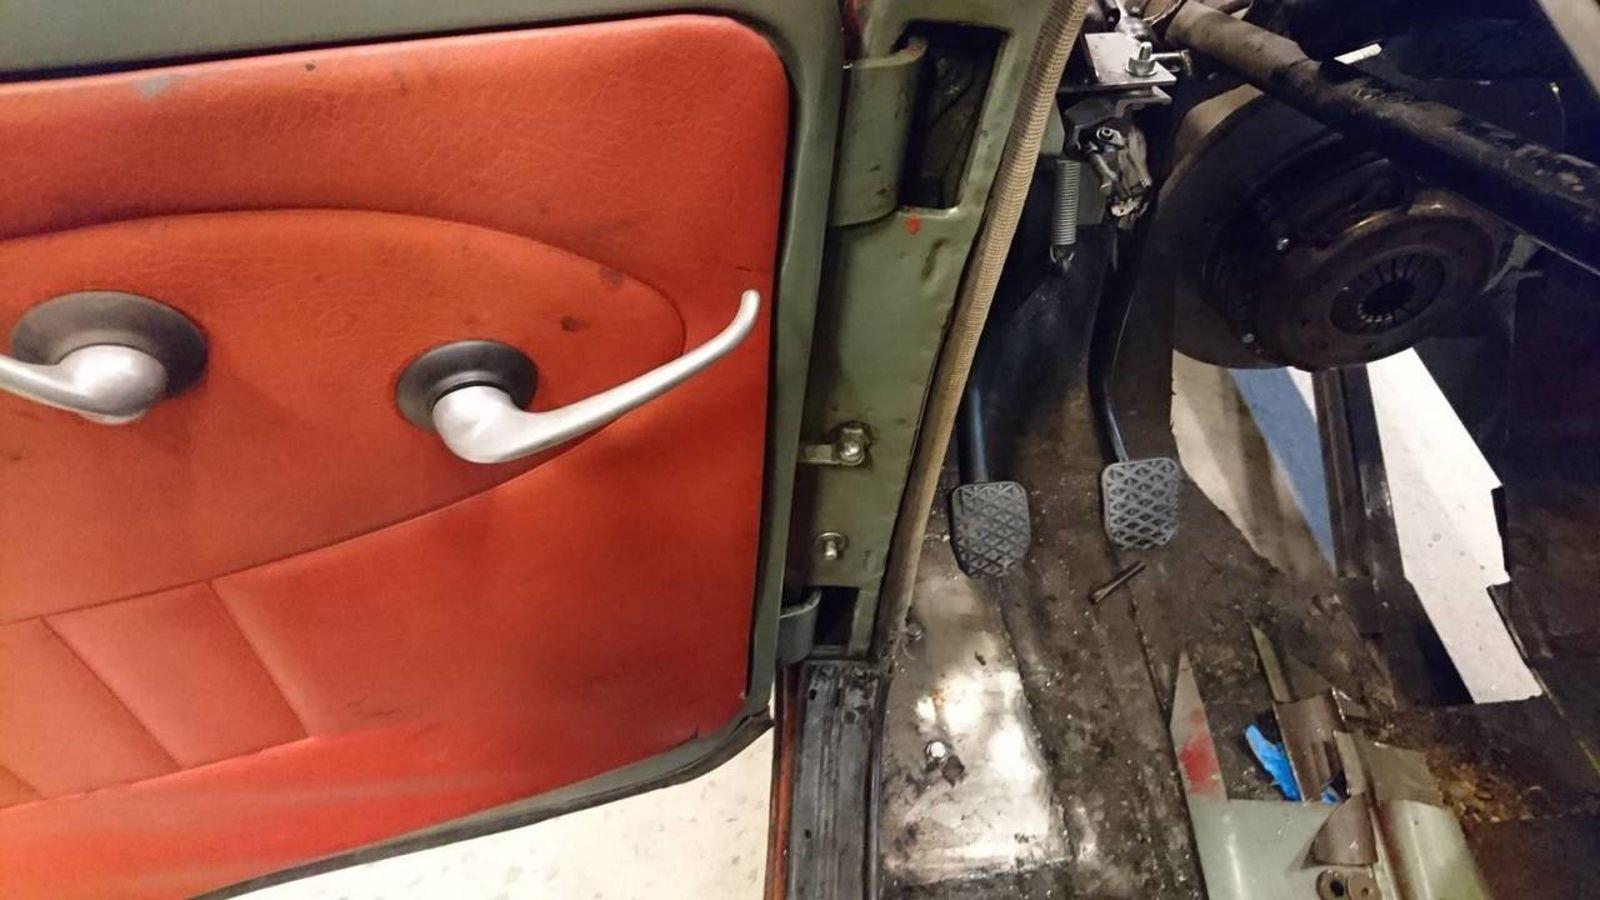 Volvo cu motor de 38.8 litri - Volvo cu motor de 38.8 litri